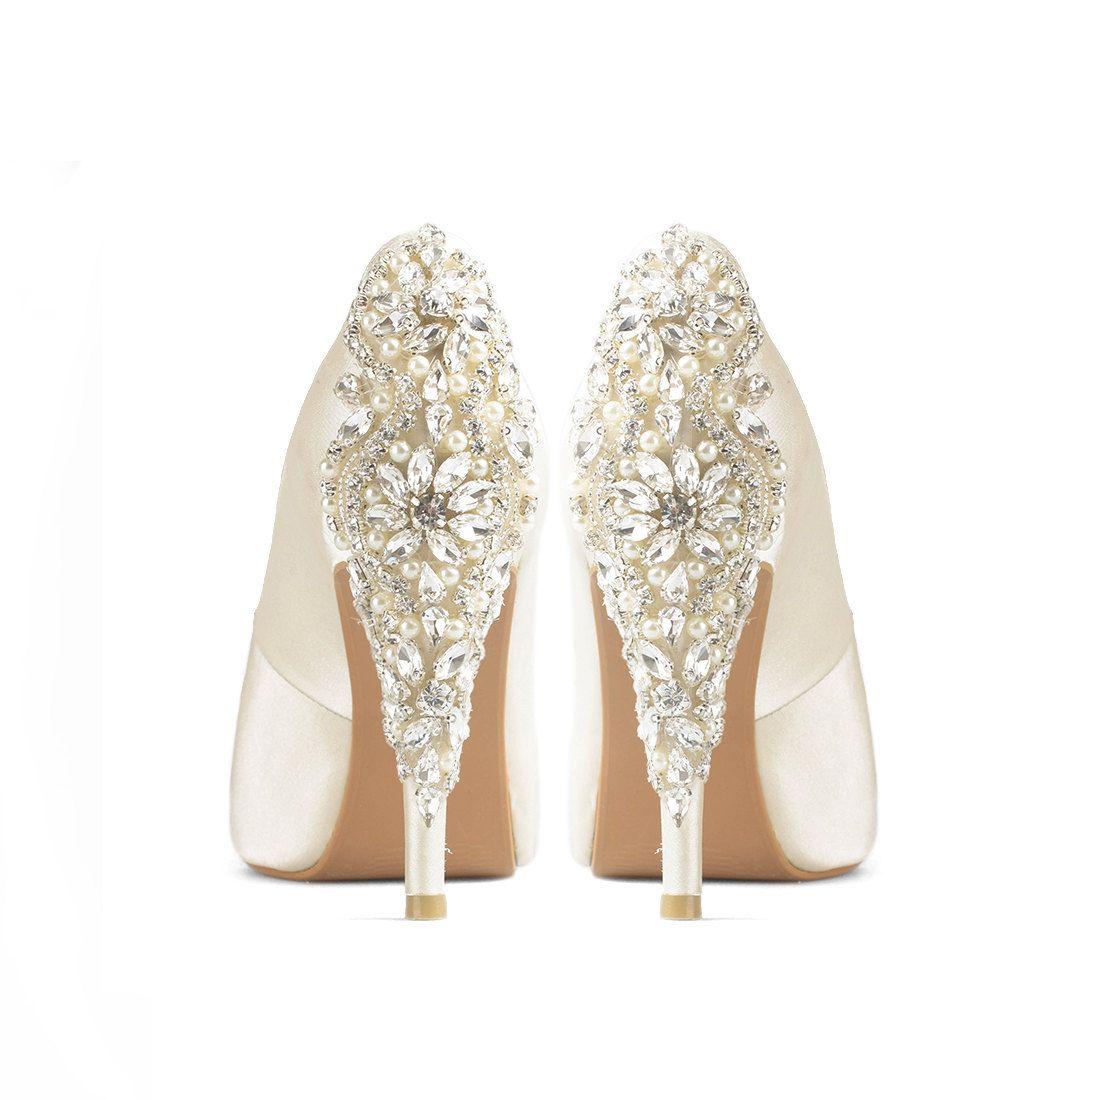 Precious Glitter Ivory Satin Wedding Shoes Ivory Satin Bridal Heels Ivory Glitter Wedding Shoes Glitter Wedding Shoes Ivory Wedding Shoes Satin Wedding Shoes